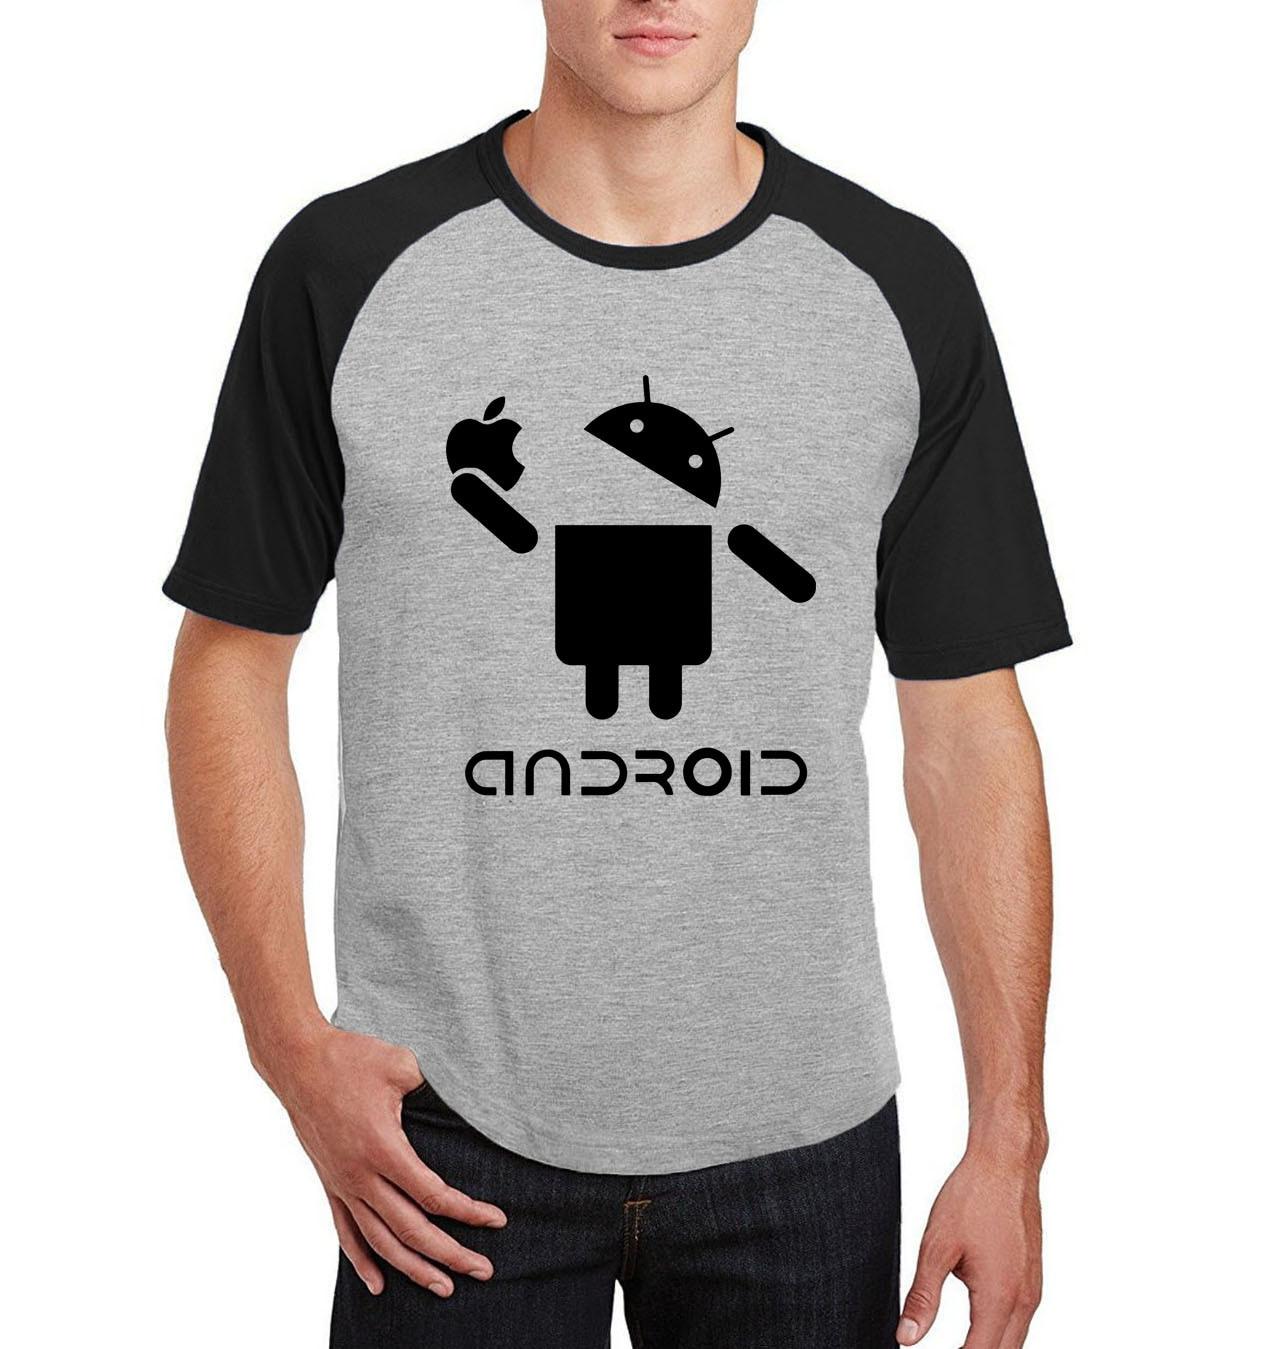 Funny hipster printed T Shirt 2019 men harajuku hip-hop harajuku camisetas summer Short sleeve raglan top fashion brand clothing